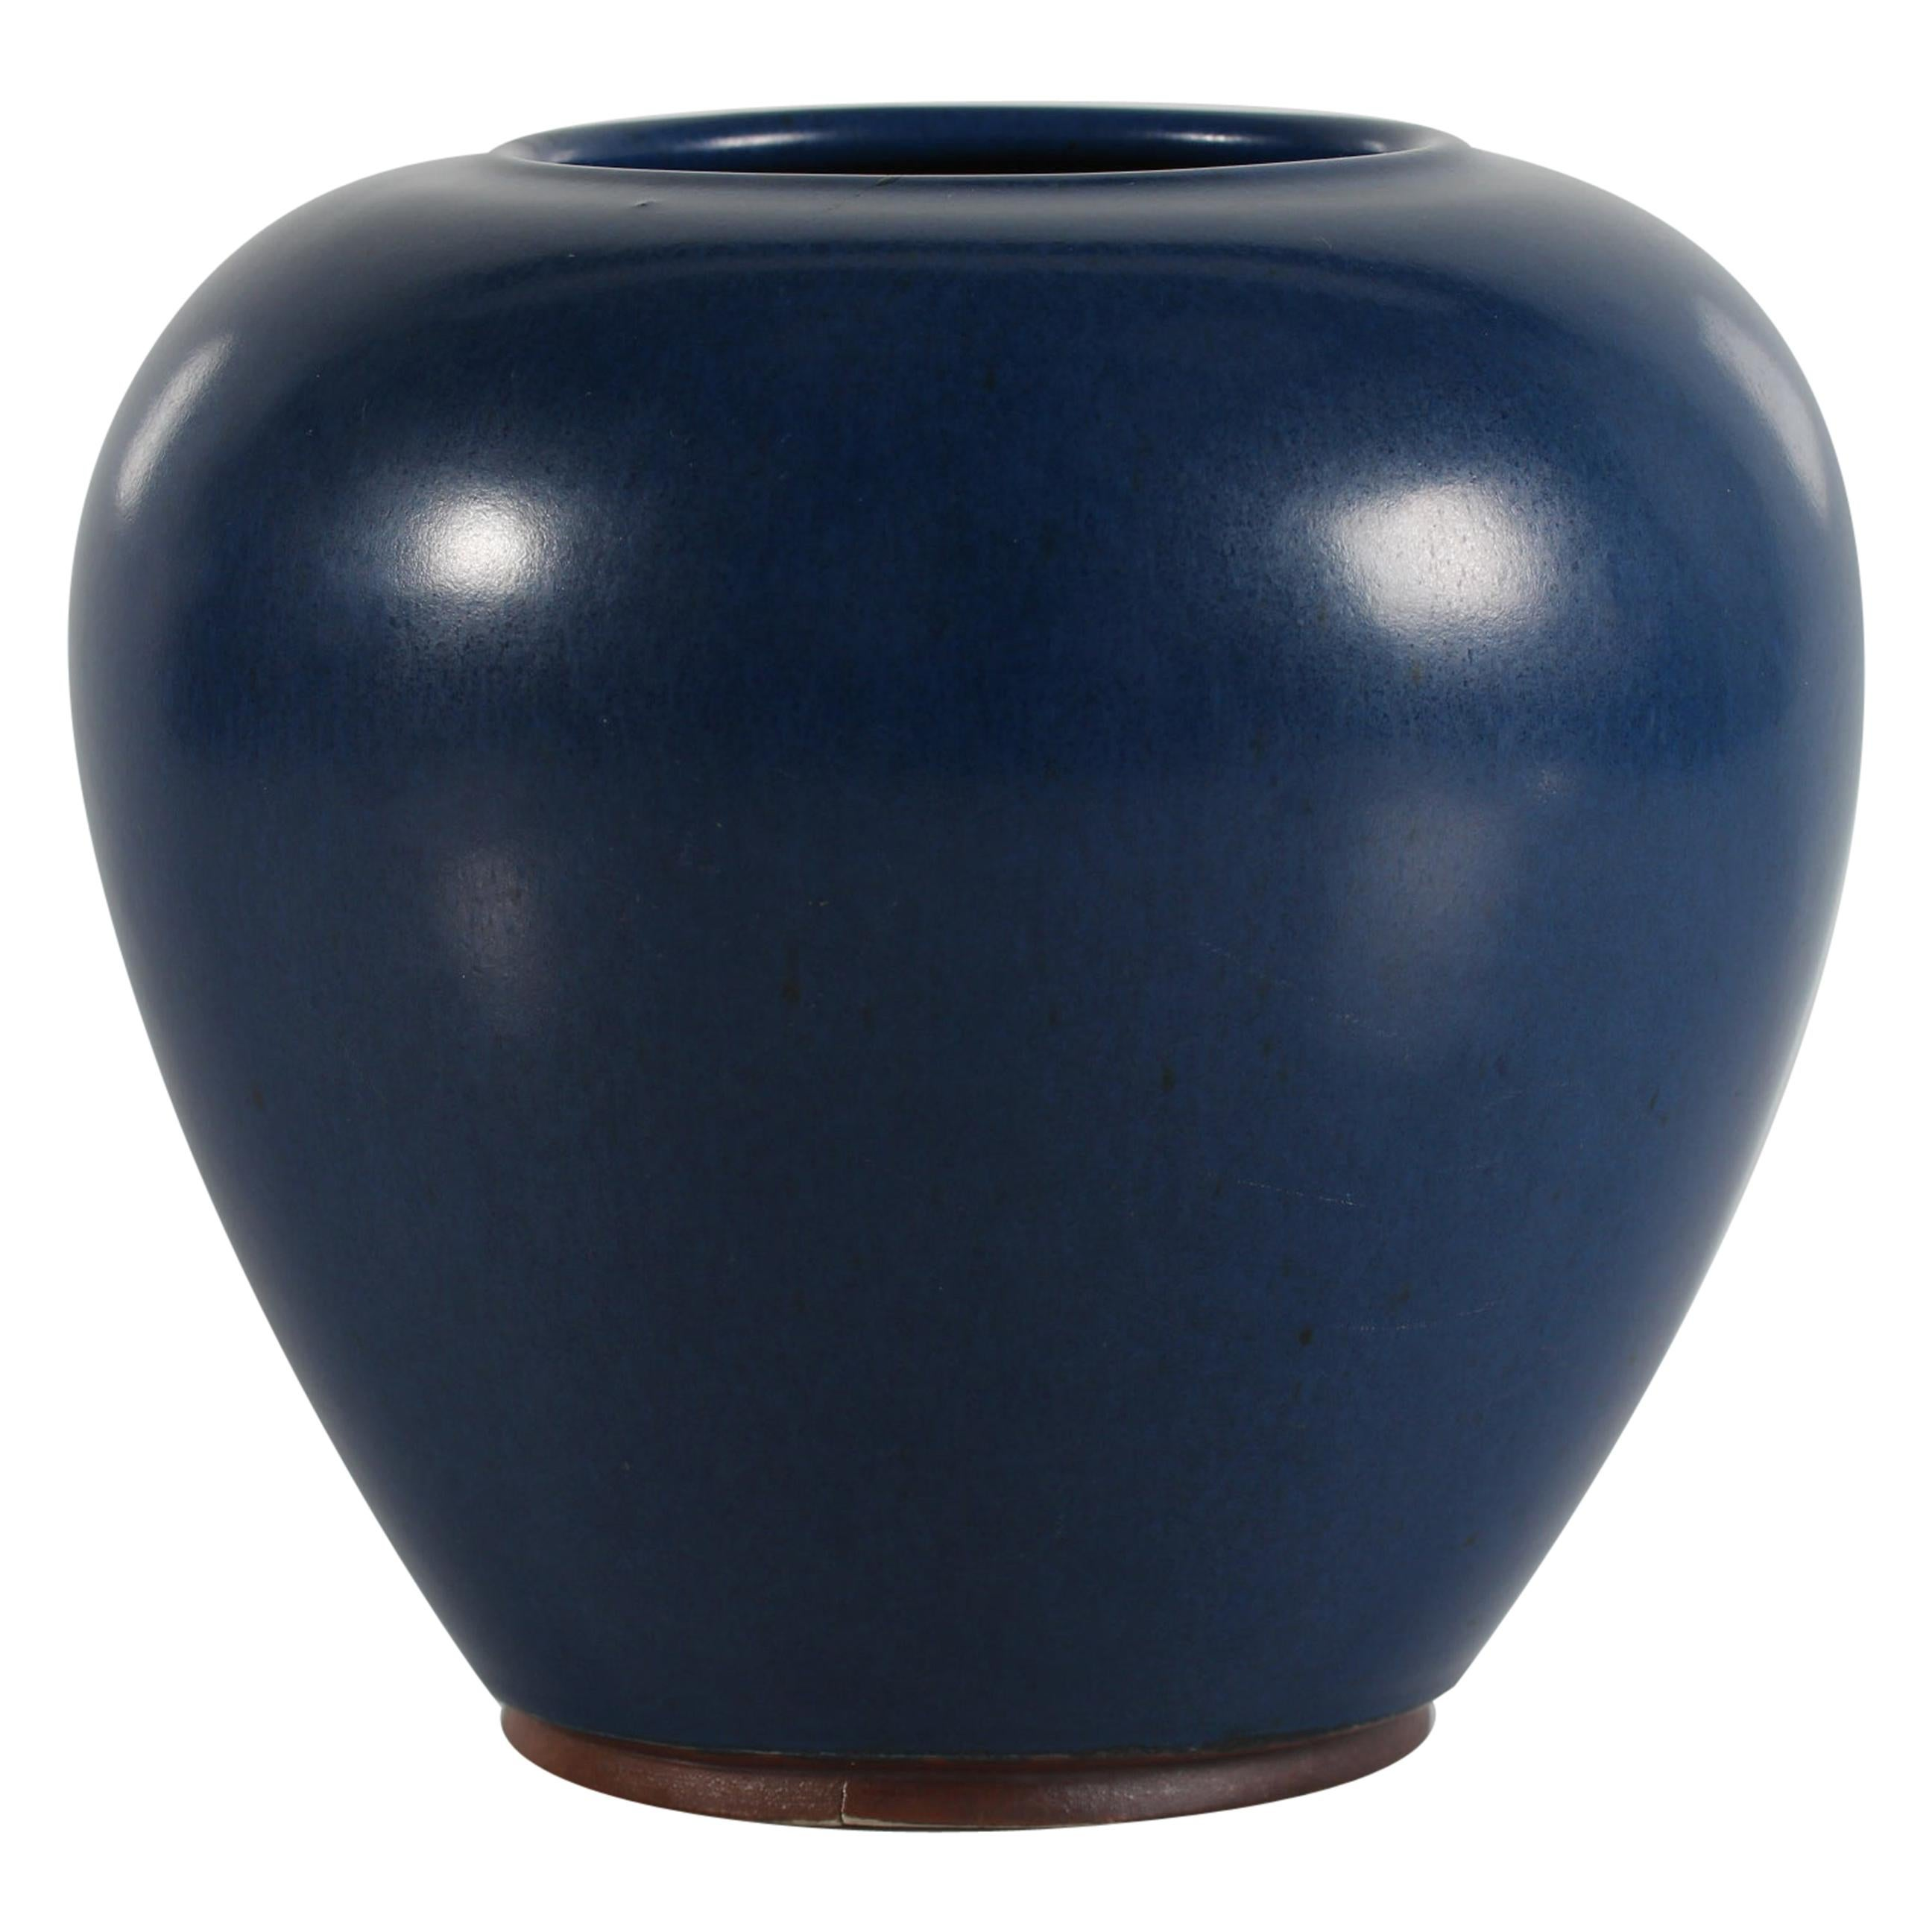 Large Saxbo Ceramic Vase No. 16 Designed by Eva Stæhr-Nielsen, Denmark 1949-1958